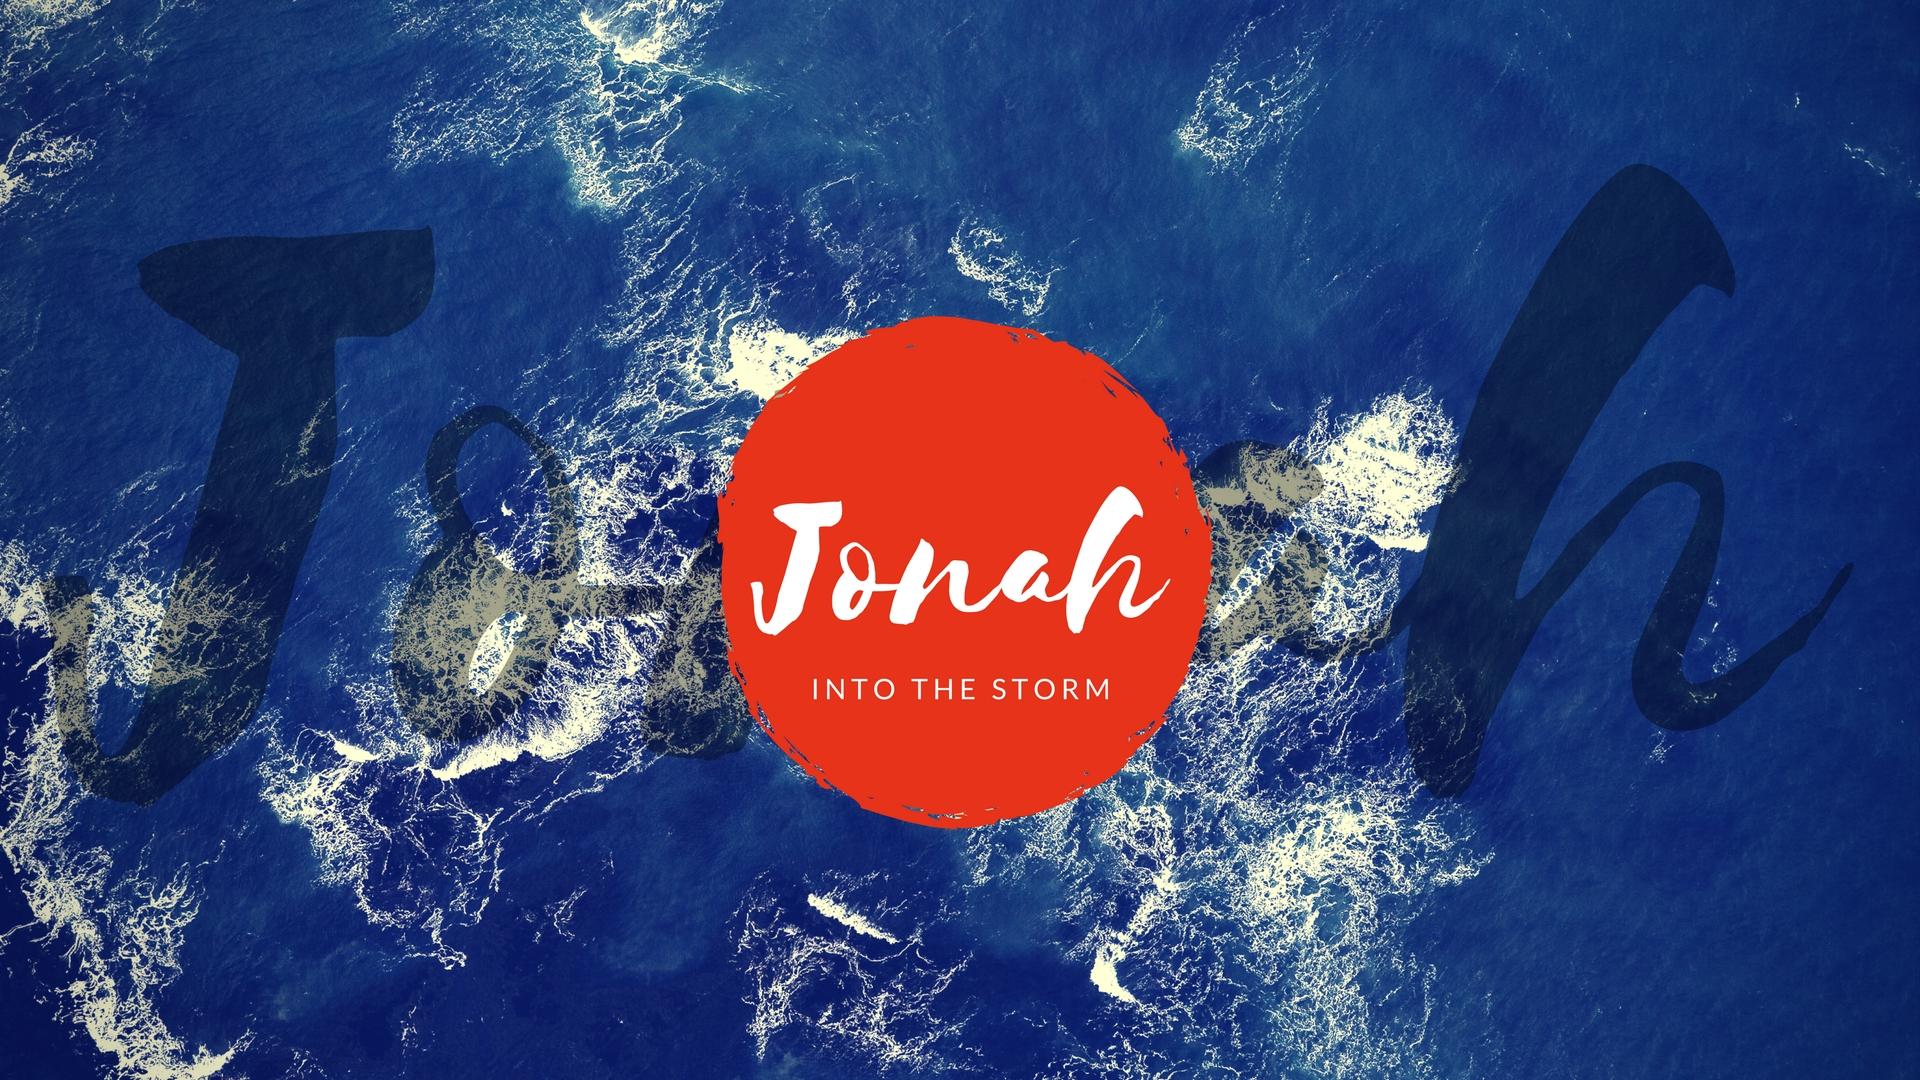 Jonah - Into The Storm (1).jpg